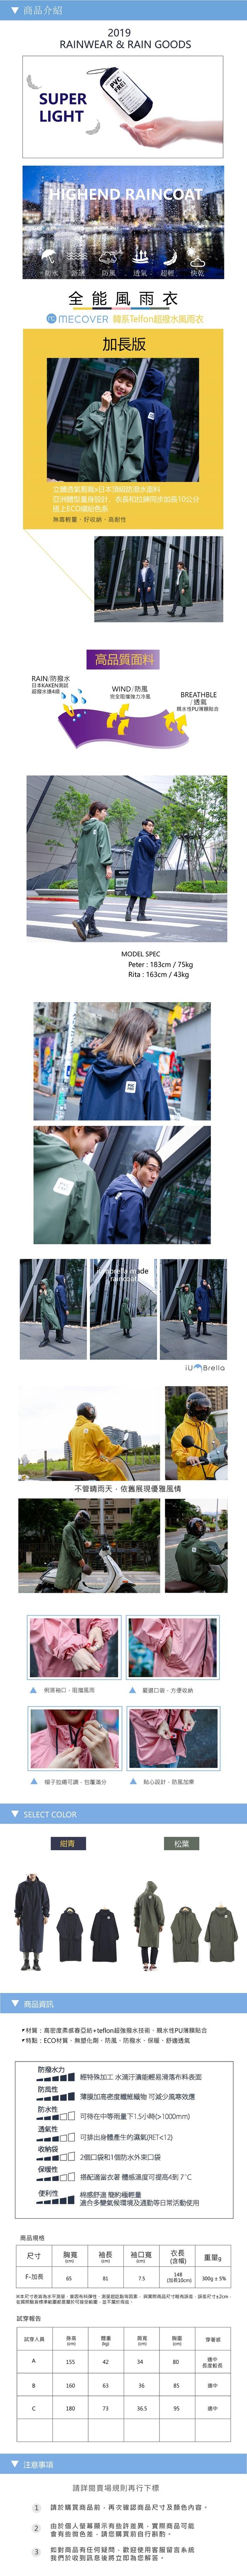 iumbrella|MECOVER 全能保暖風雨衣-加長版( 紺青 )